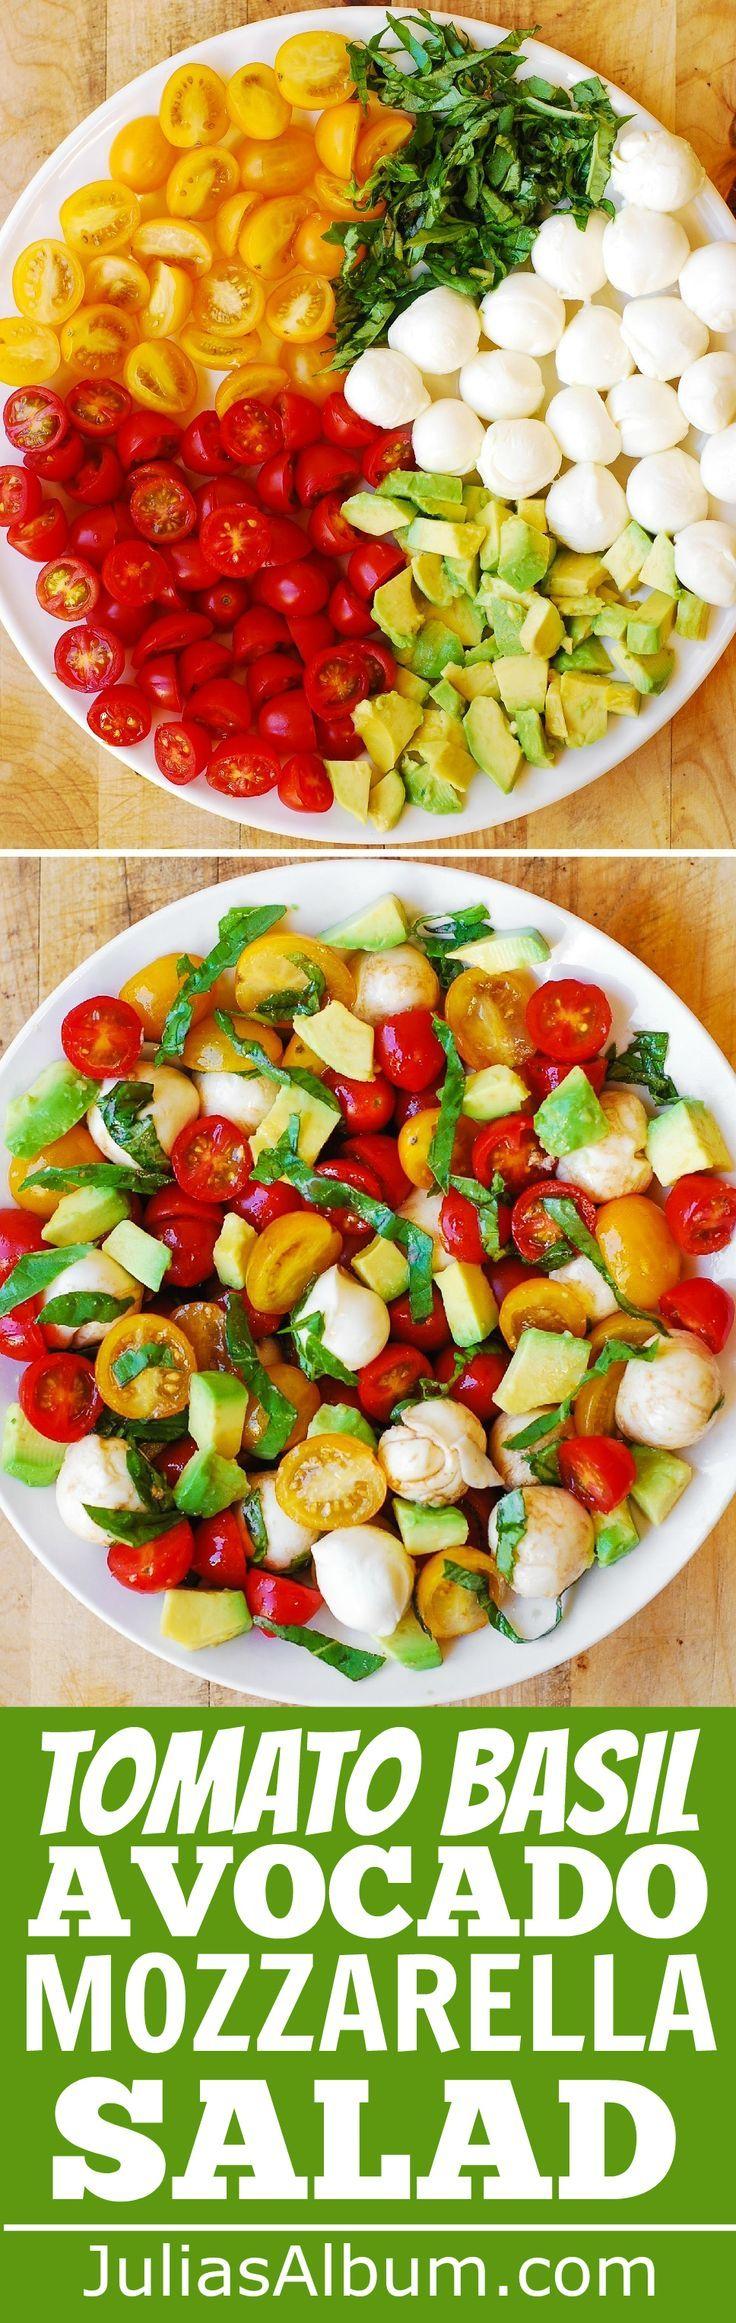 Tomates rouges et jaunes, basilic, avocat, Mozzarella